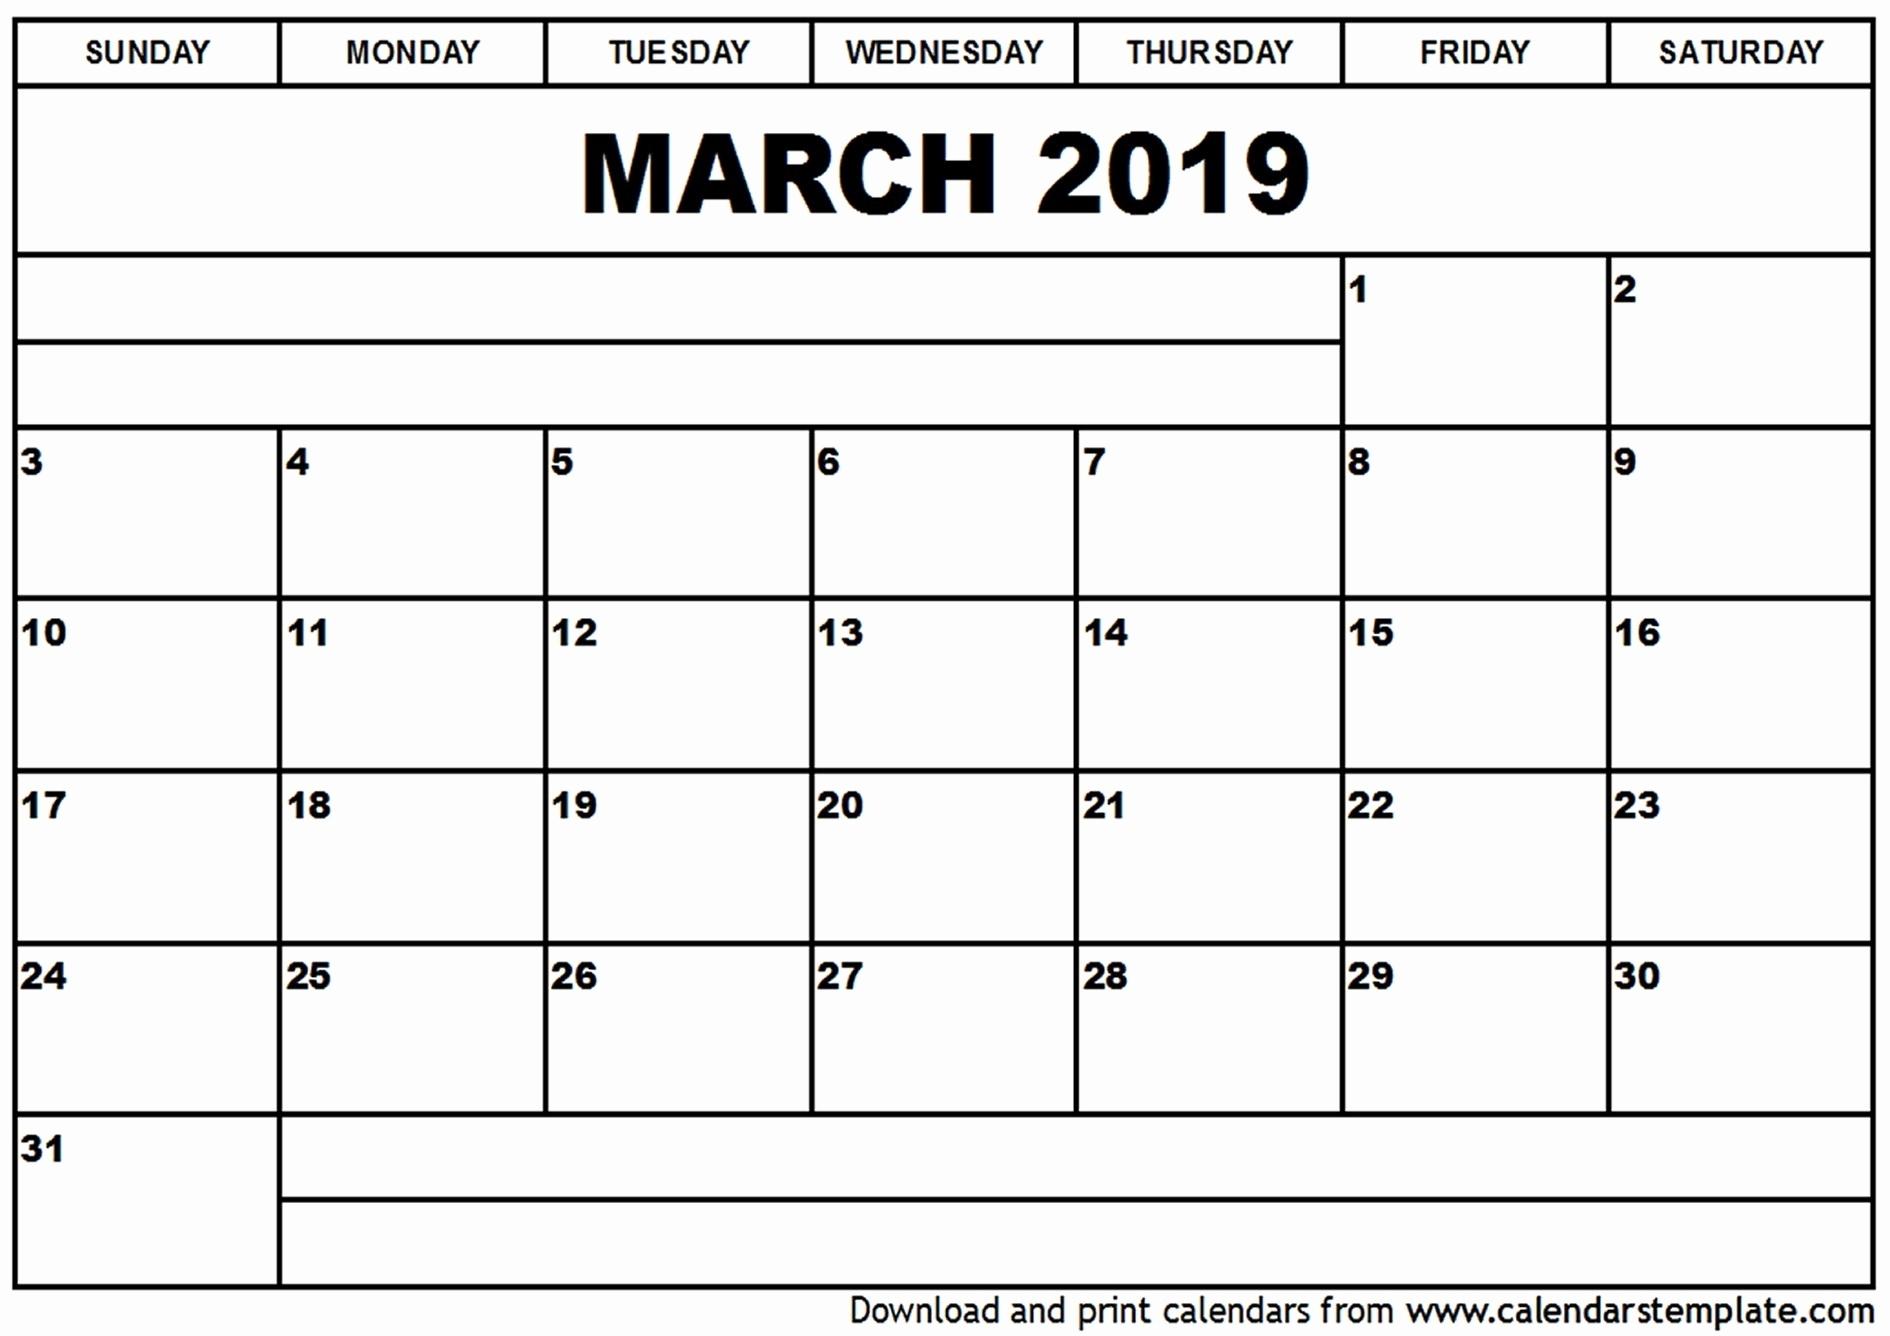 Editable Free Blank Monthly Calendar Template - Calendar